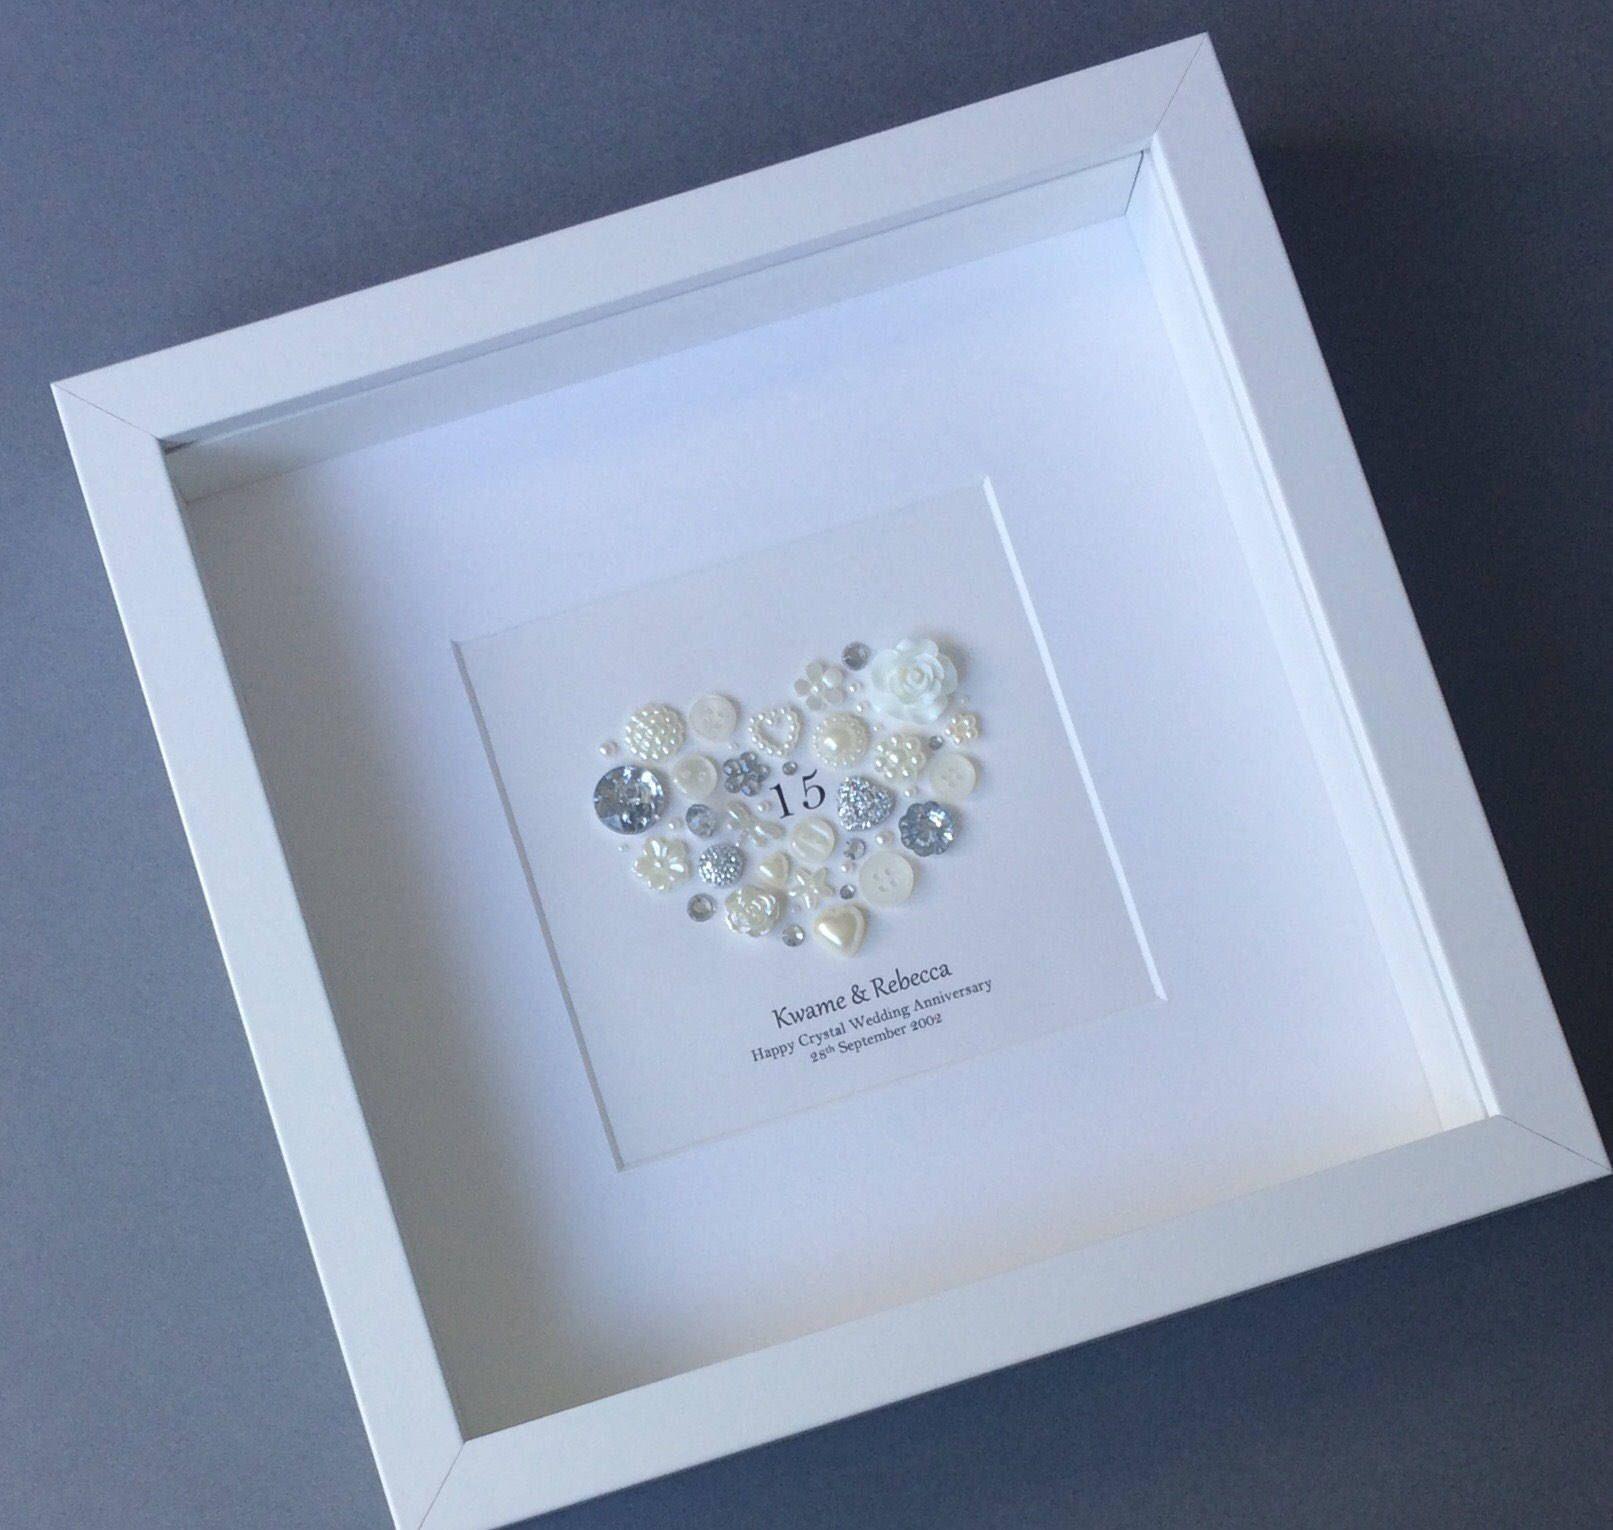 15th Wedding Anniversary Gift, Crystal Anniversary Frame